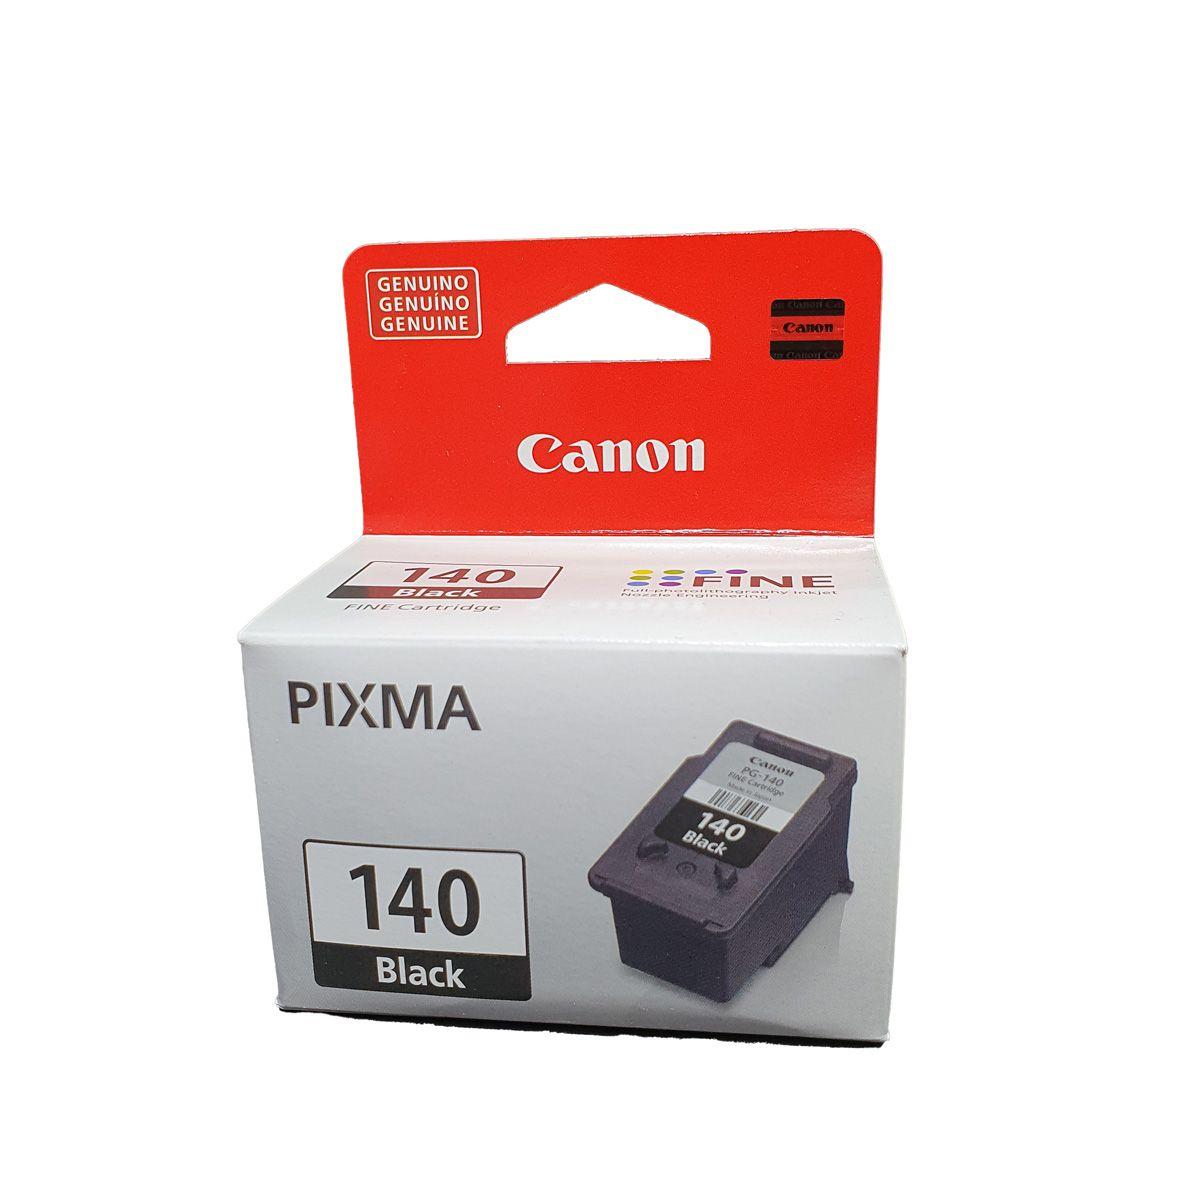 Cartucho Canon PG140 Preto para MG2110 MG3110 MG3510 MG3210 MG4110 MG3210 MX431 MX371